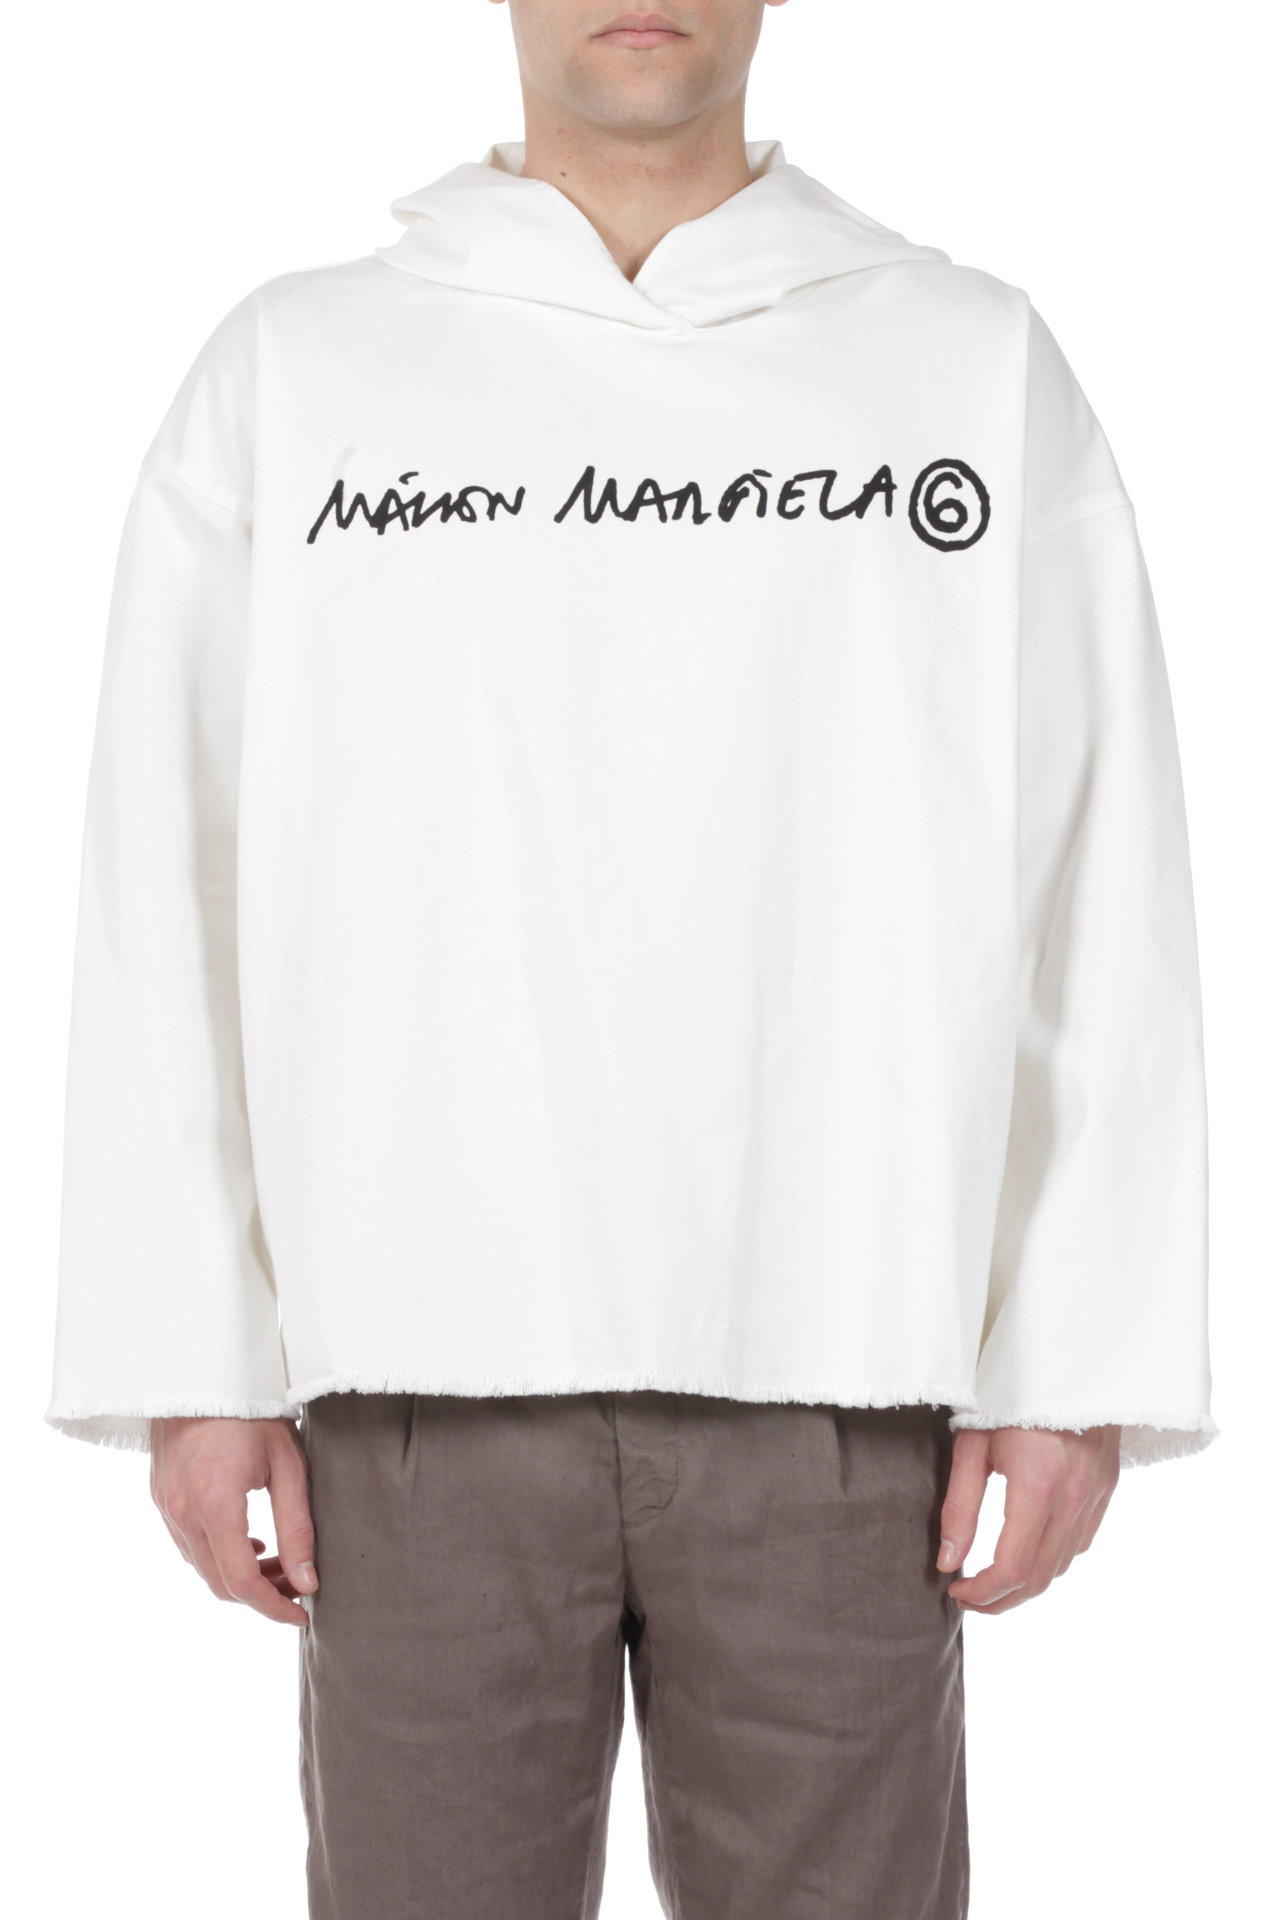 MM6 MAISON MARGIELA | Sweartshirt | S62NC0066 S30653101